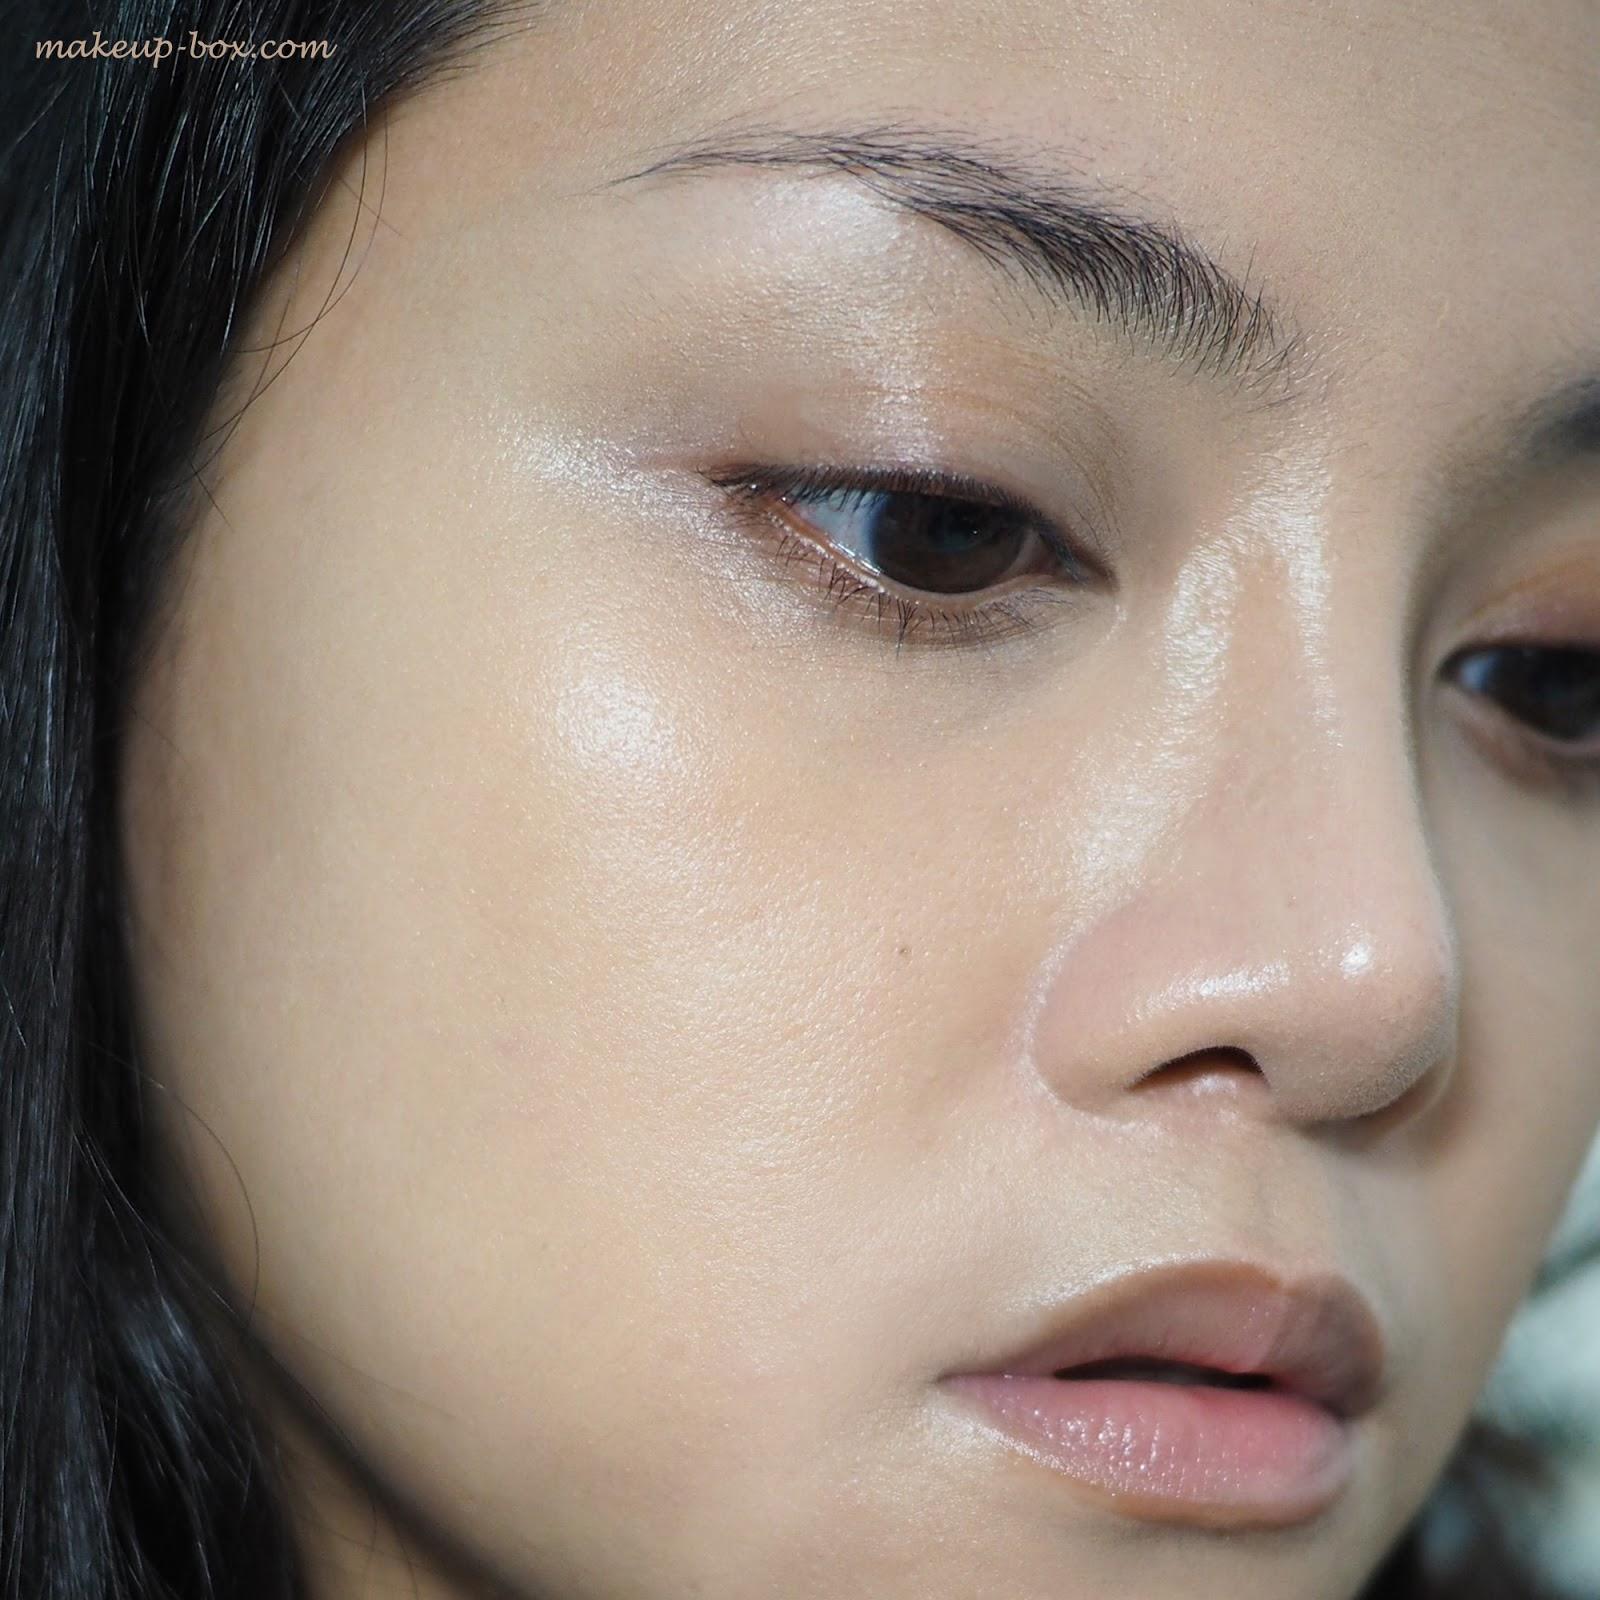 The Makeup Box Cle De Peau Beaute Radiant Cream Foundation And